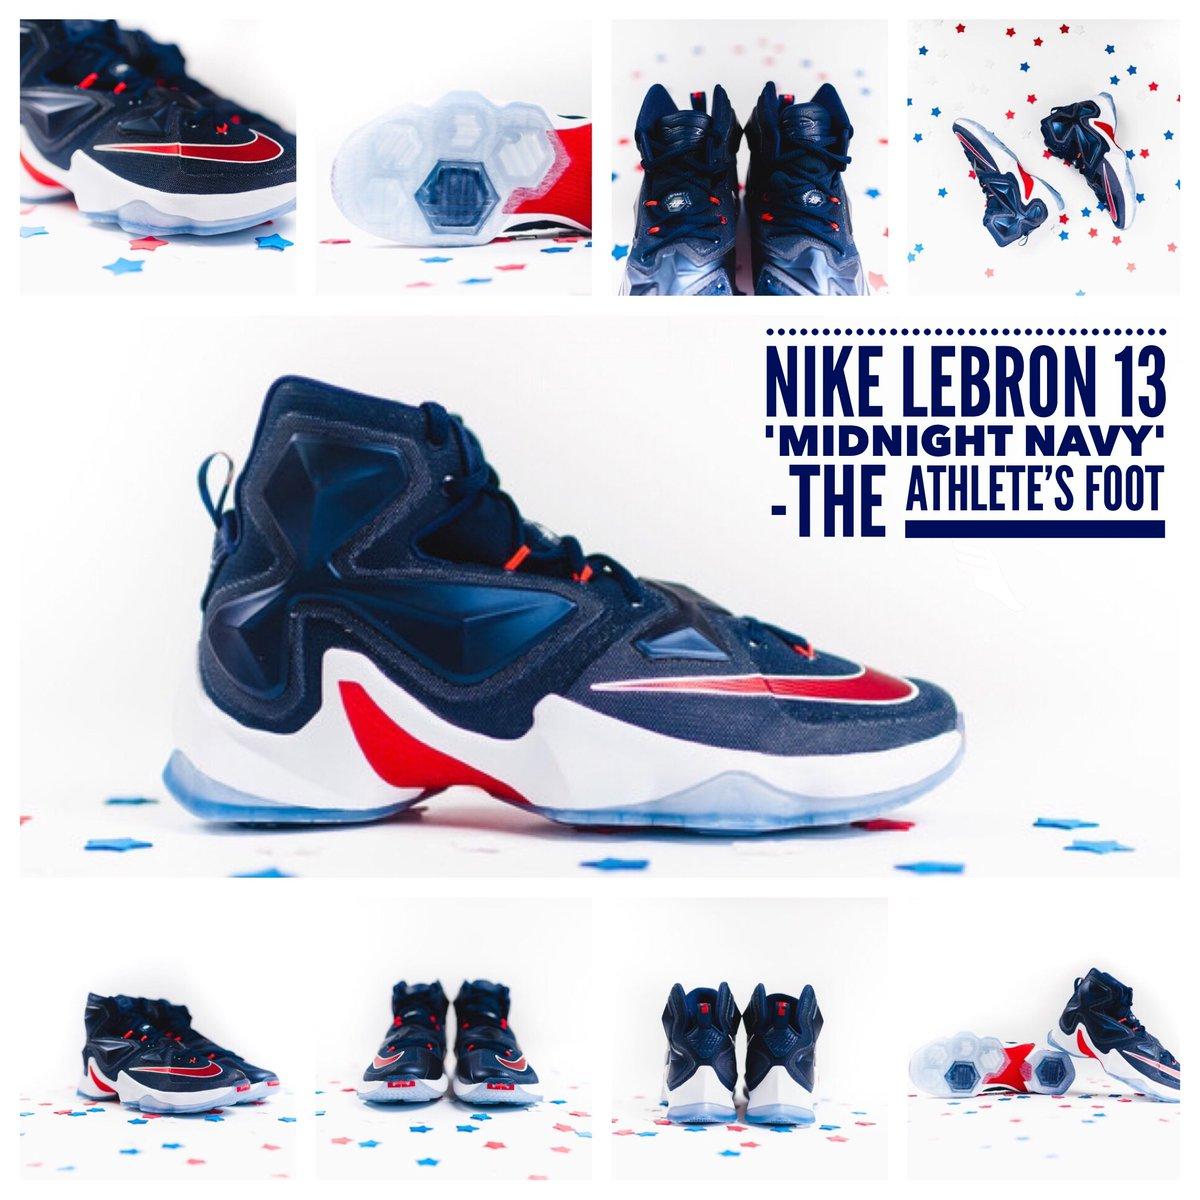 on sale 2946f 0d3c7 The Athletes Foot NC on Twitter: